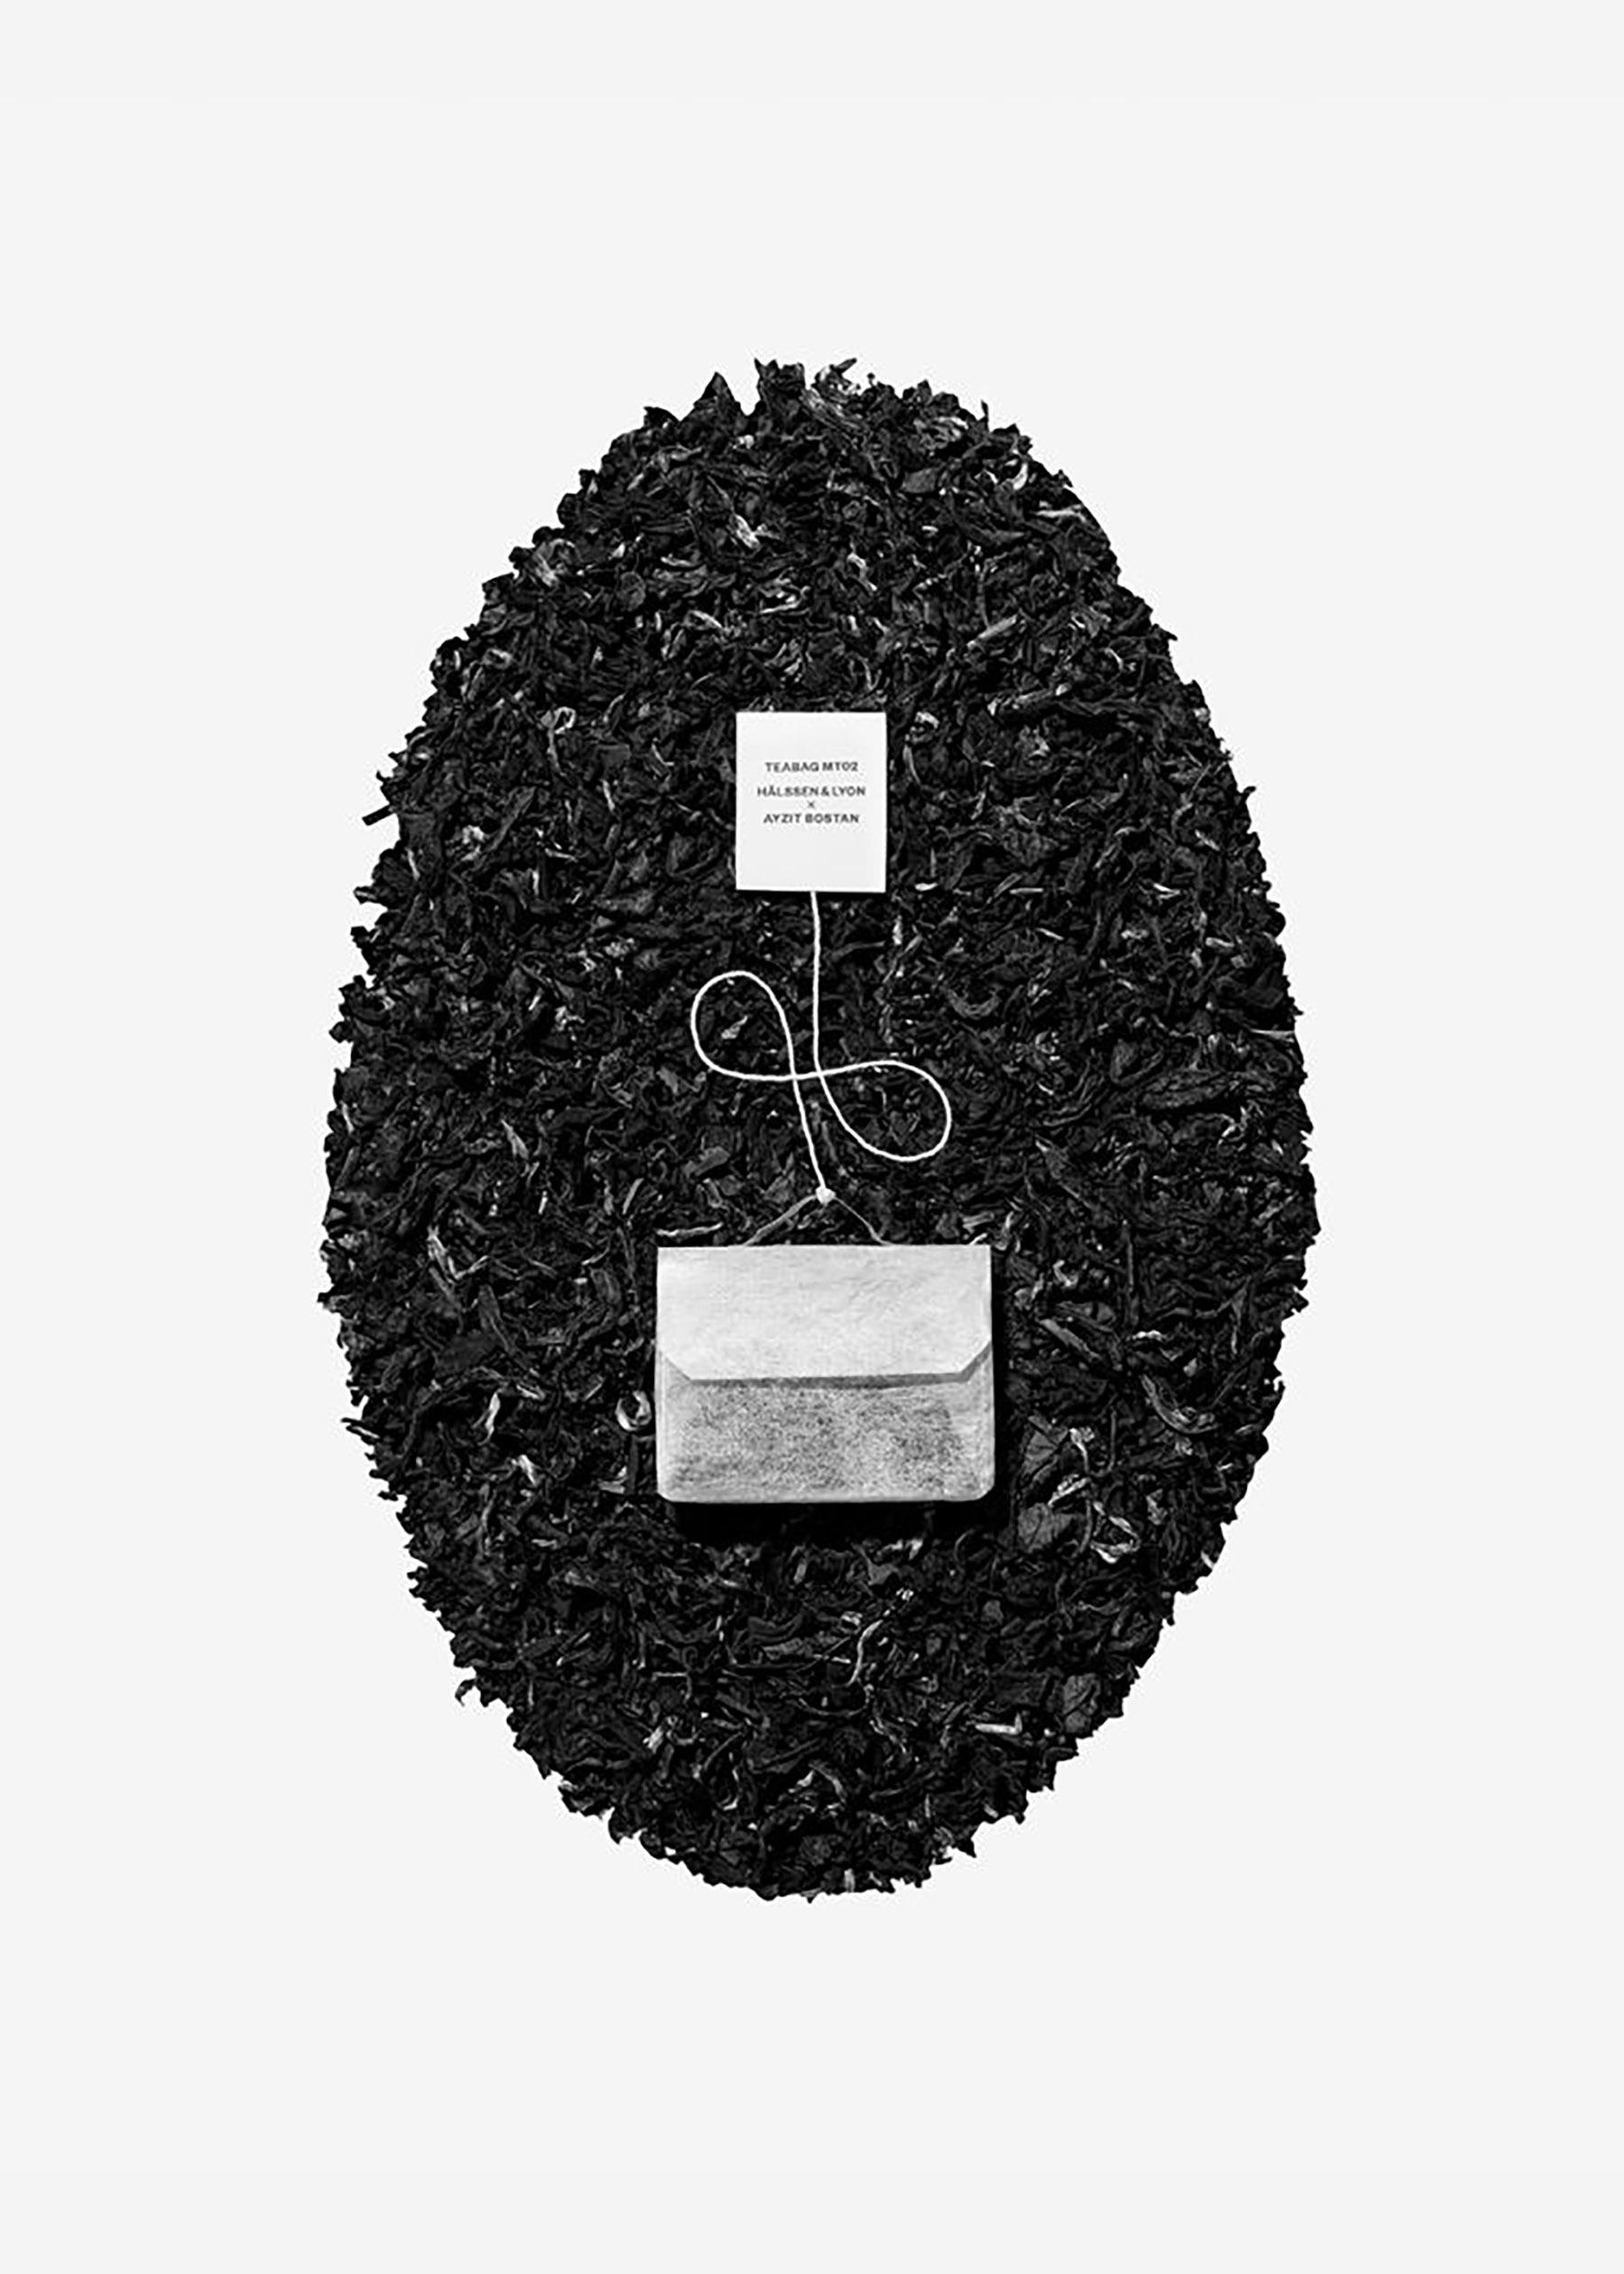 iGNANT-Design-Halssen-&-Lyon-Ayzit-Bostan-The-Teabag-Collection-15